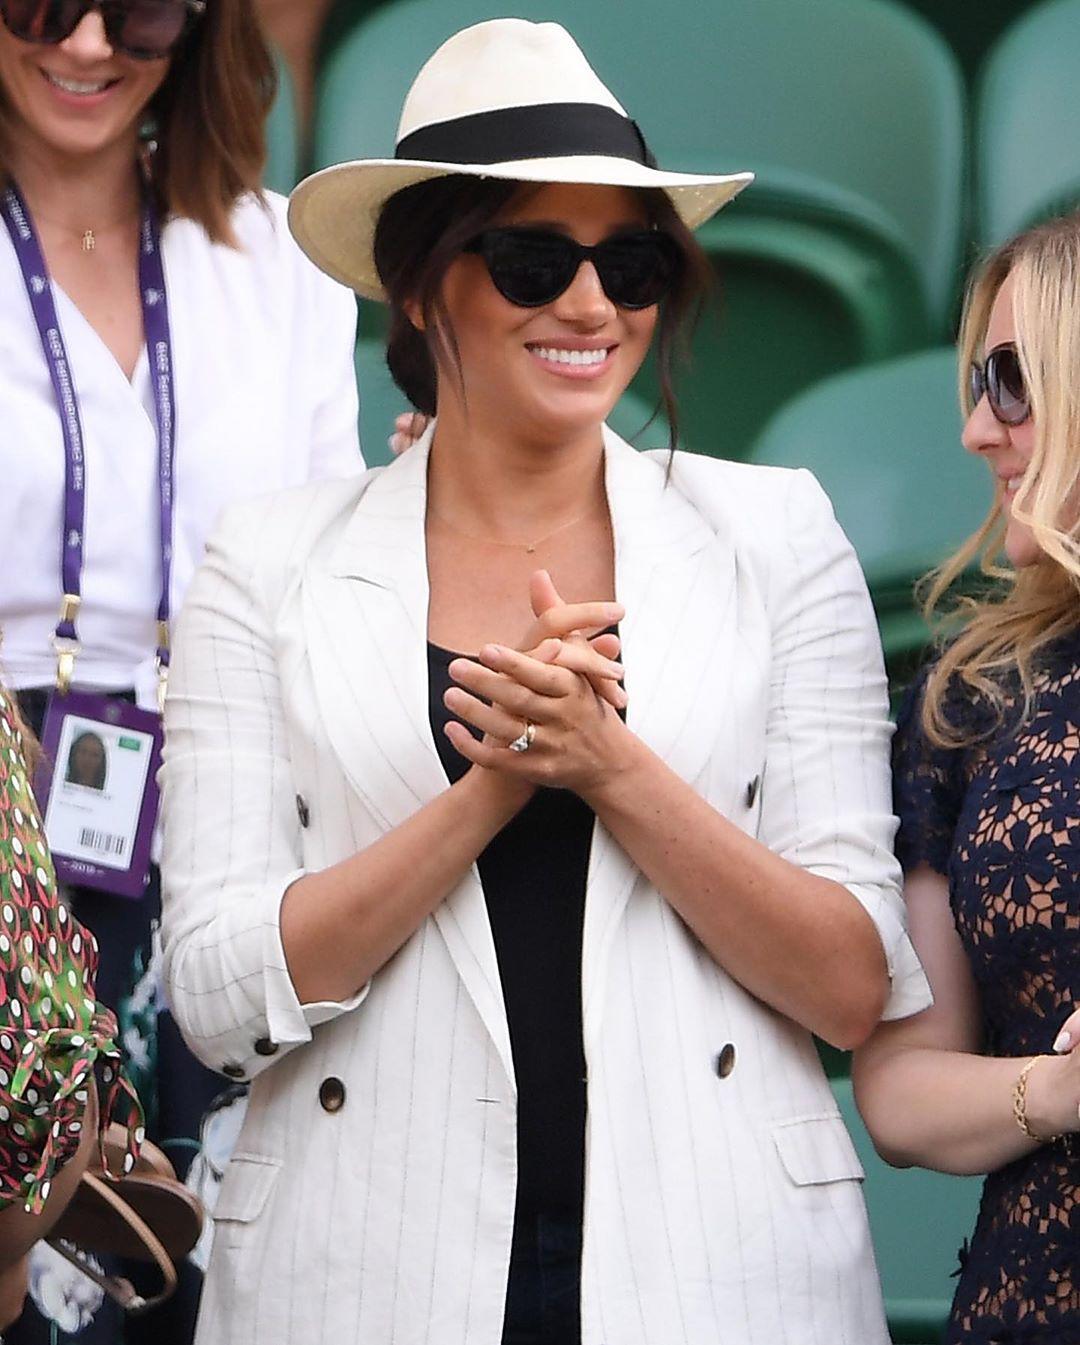 Фото: Меган Маркл в пиджаке L'Agence посетила Wimbledon